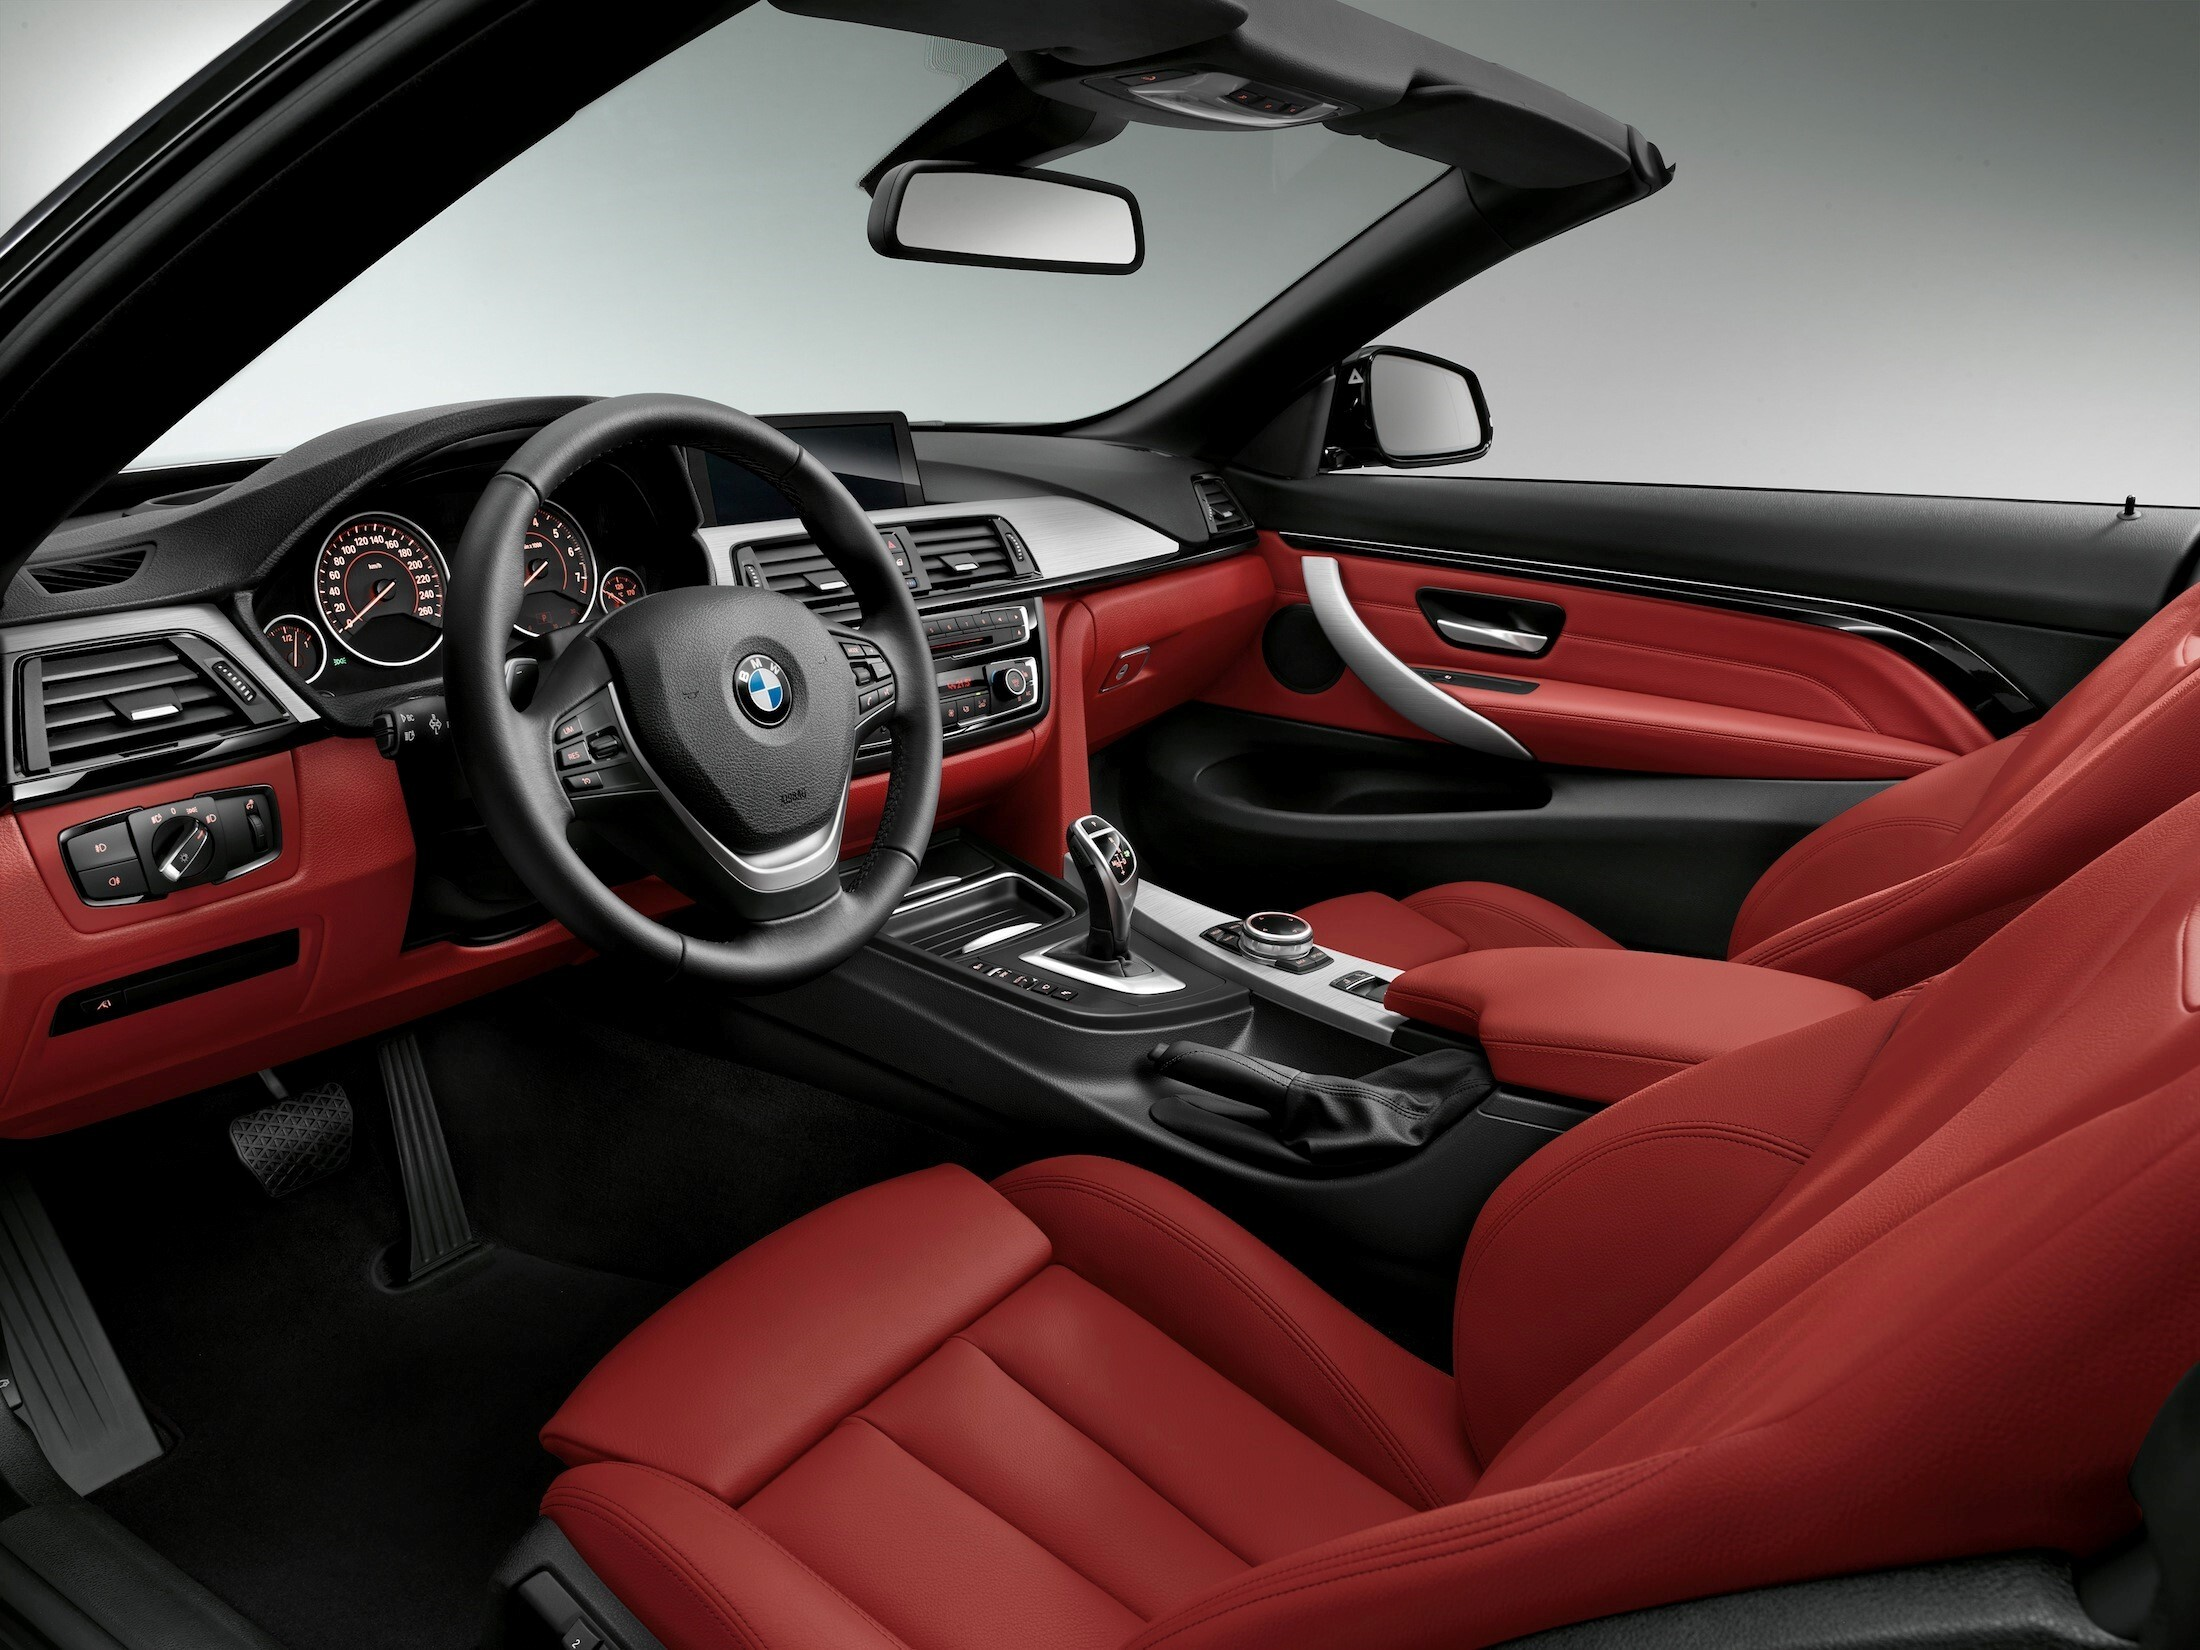 Bmw 4 Series Convertible Interior Cars Dashboard Wallpapers Hd